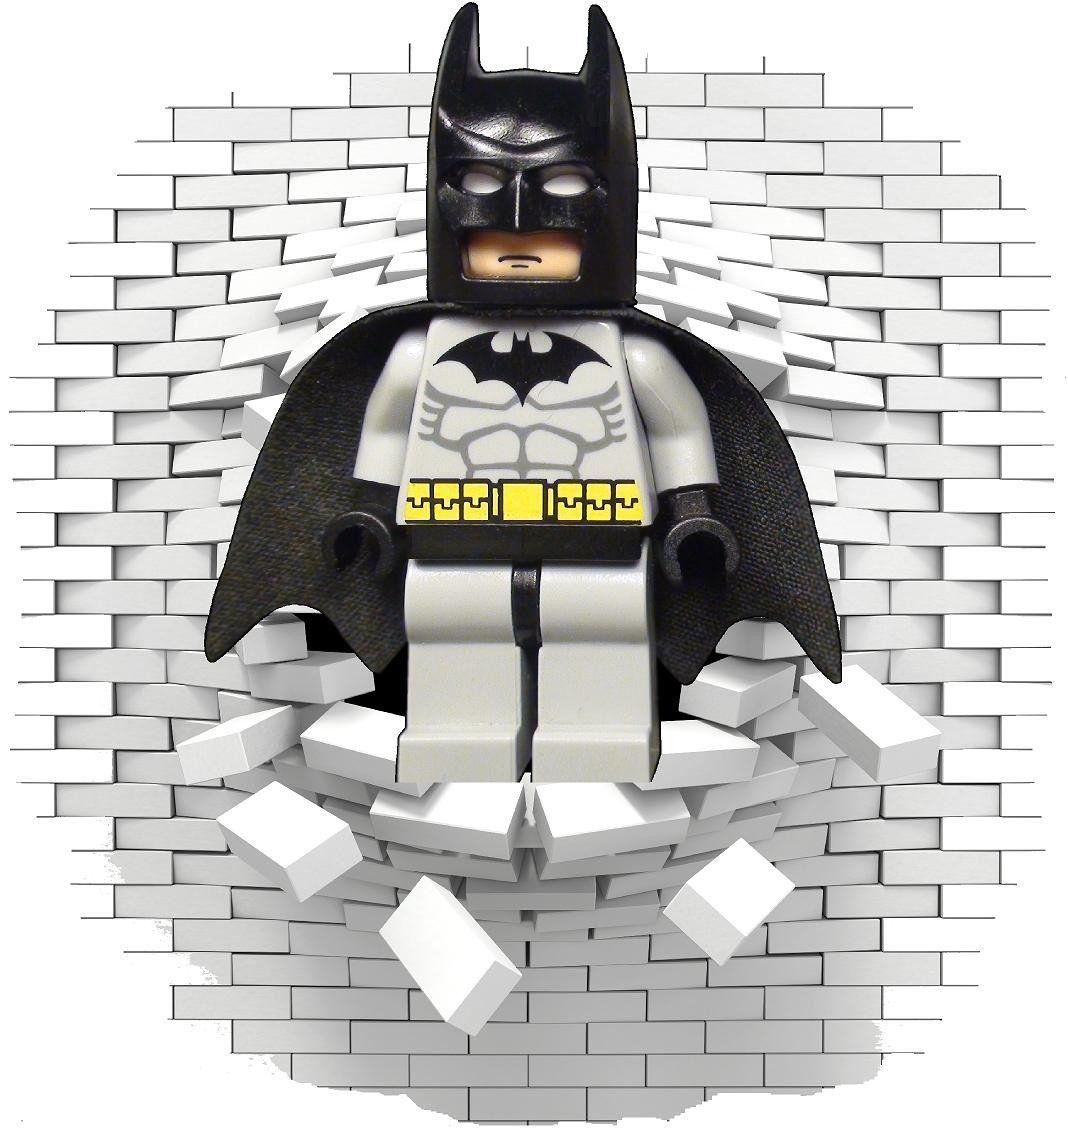 Lego Batman Wall Stickers And Decals Batman Wall Lego Batman